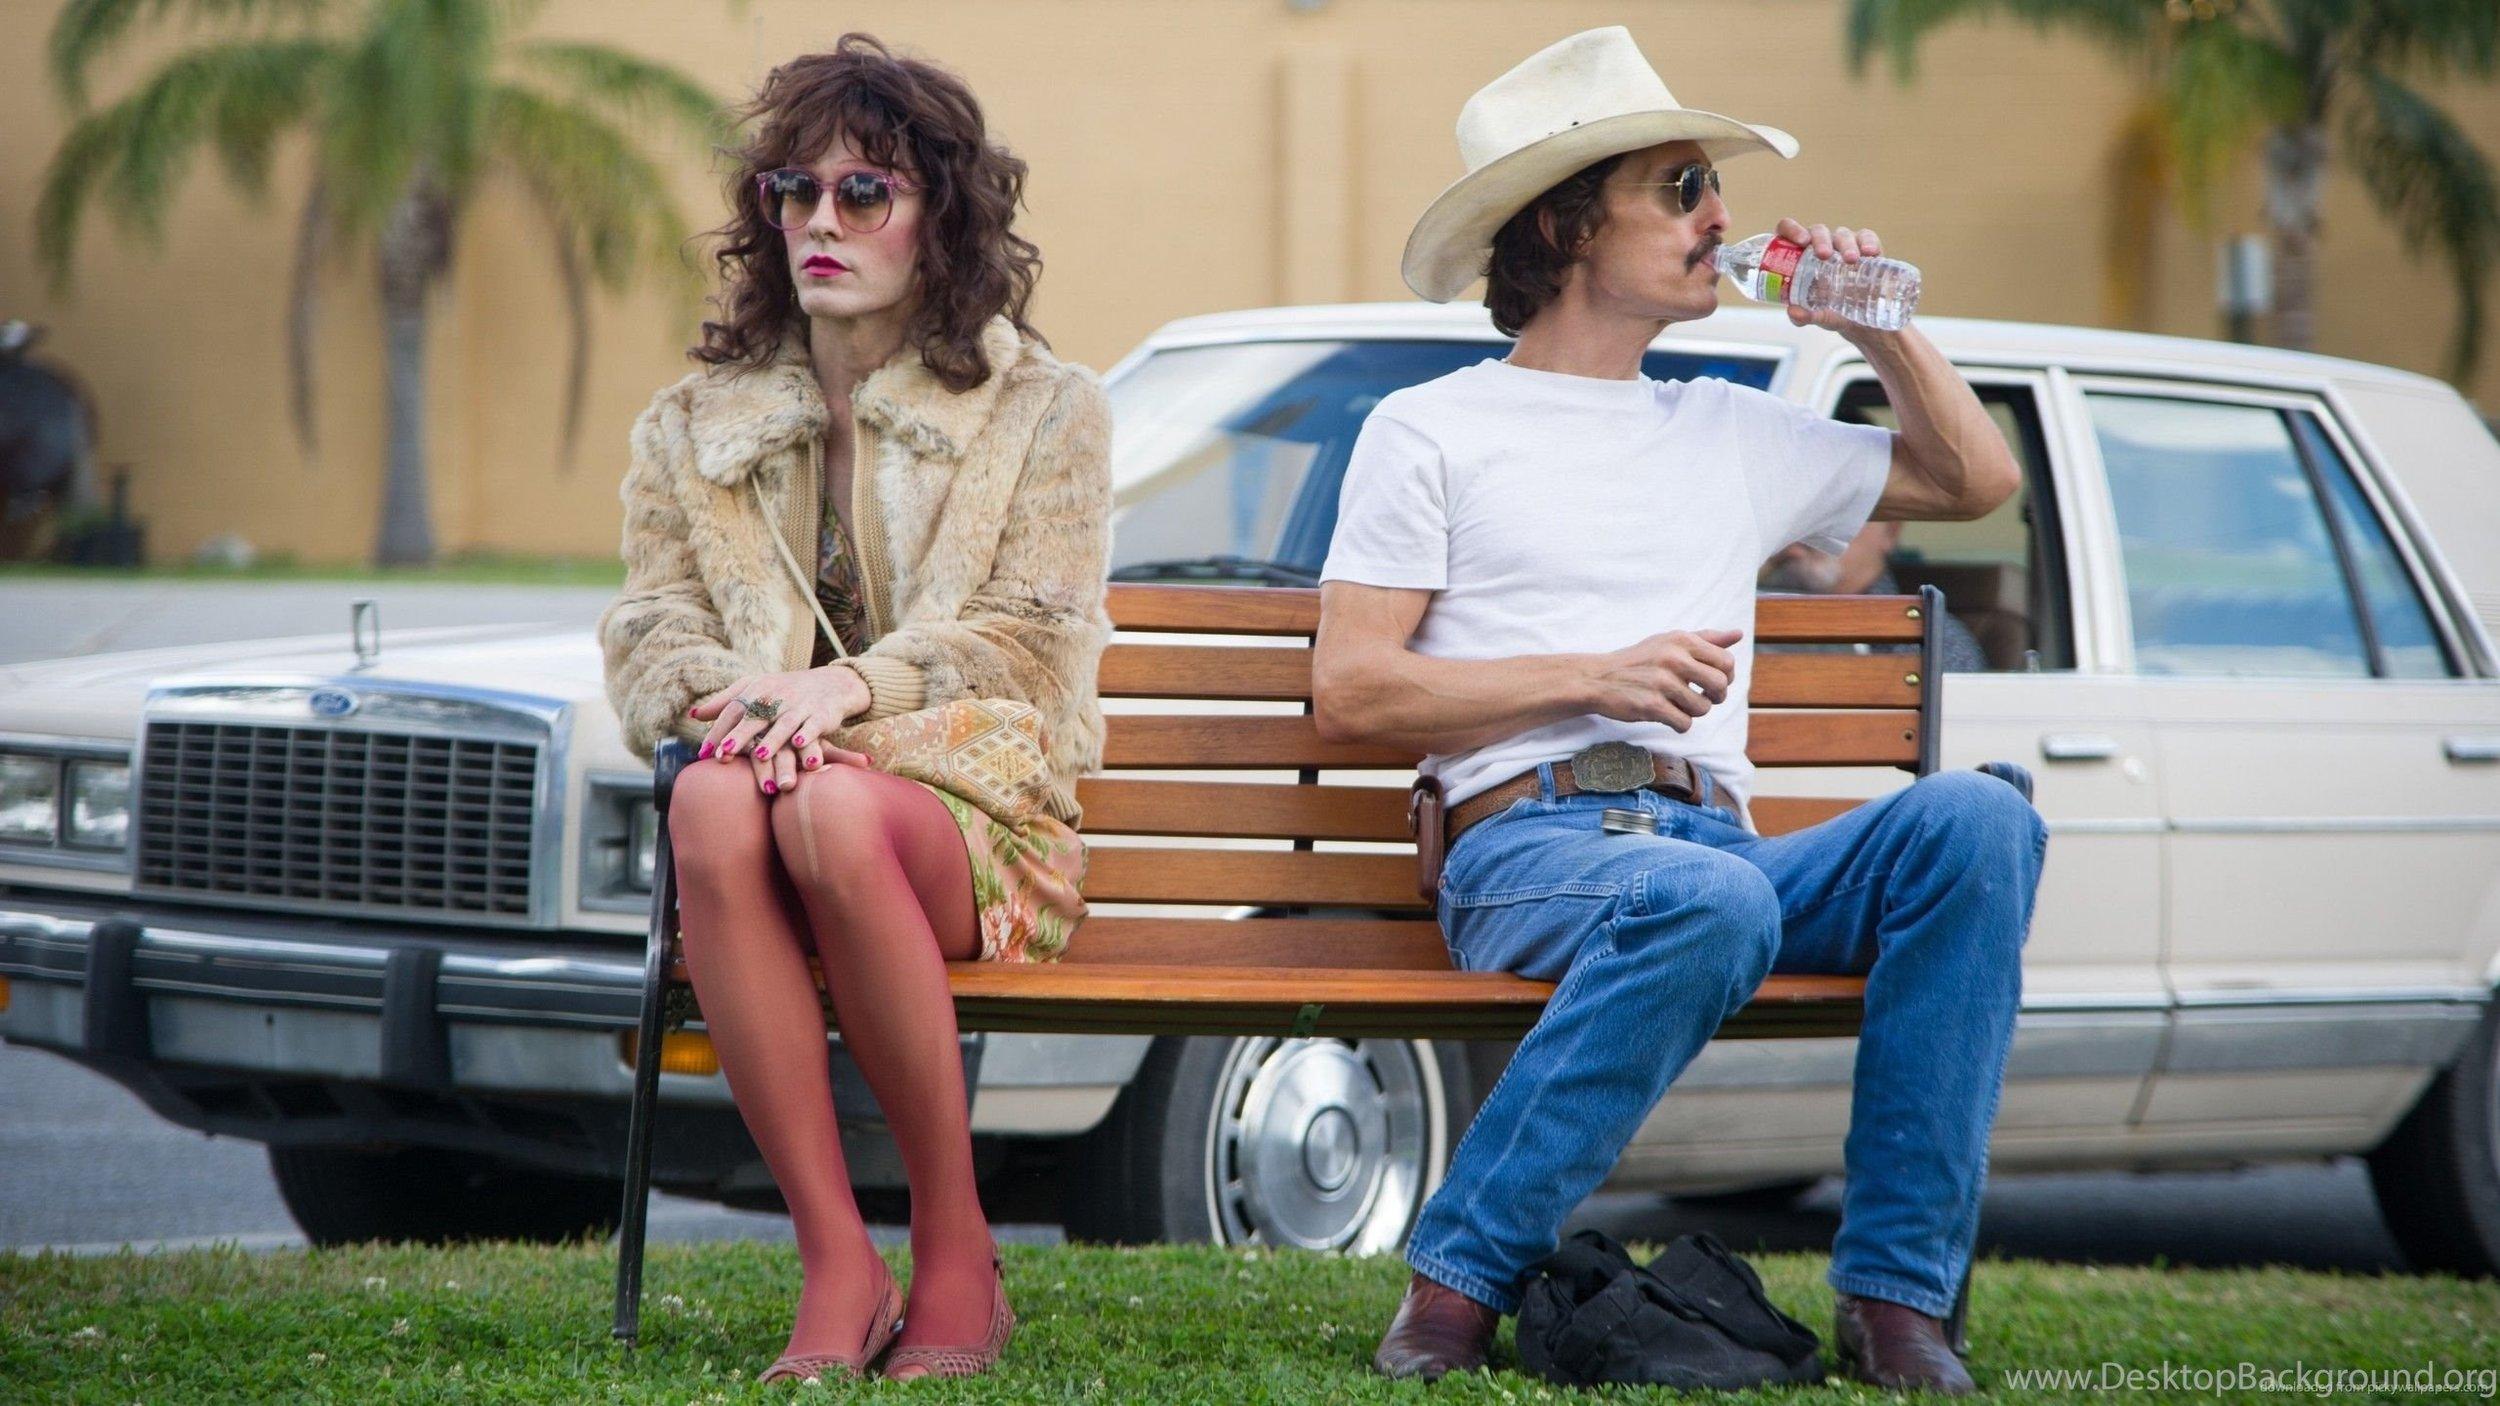 Dallas Buyers Club (2013) - Directed by: Jean-Marc ValléeWritten by: Craig Borten & Melisa Wallack